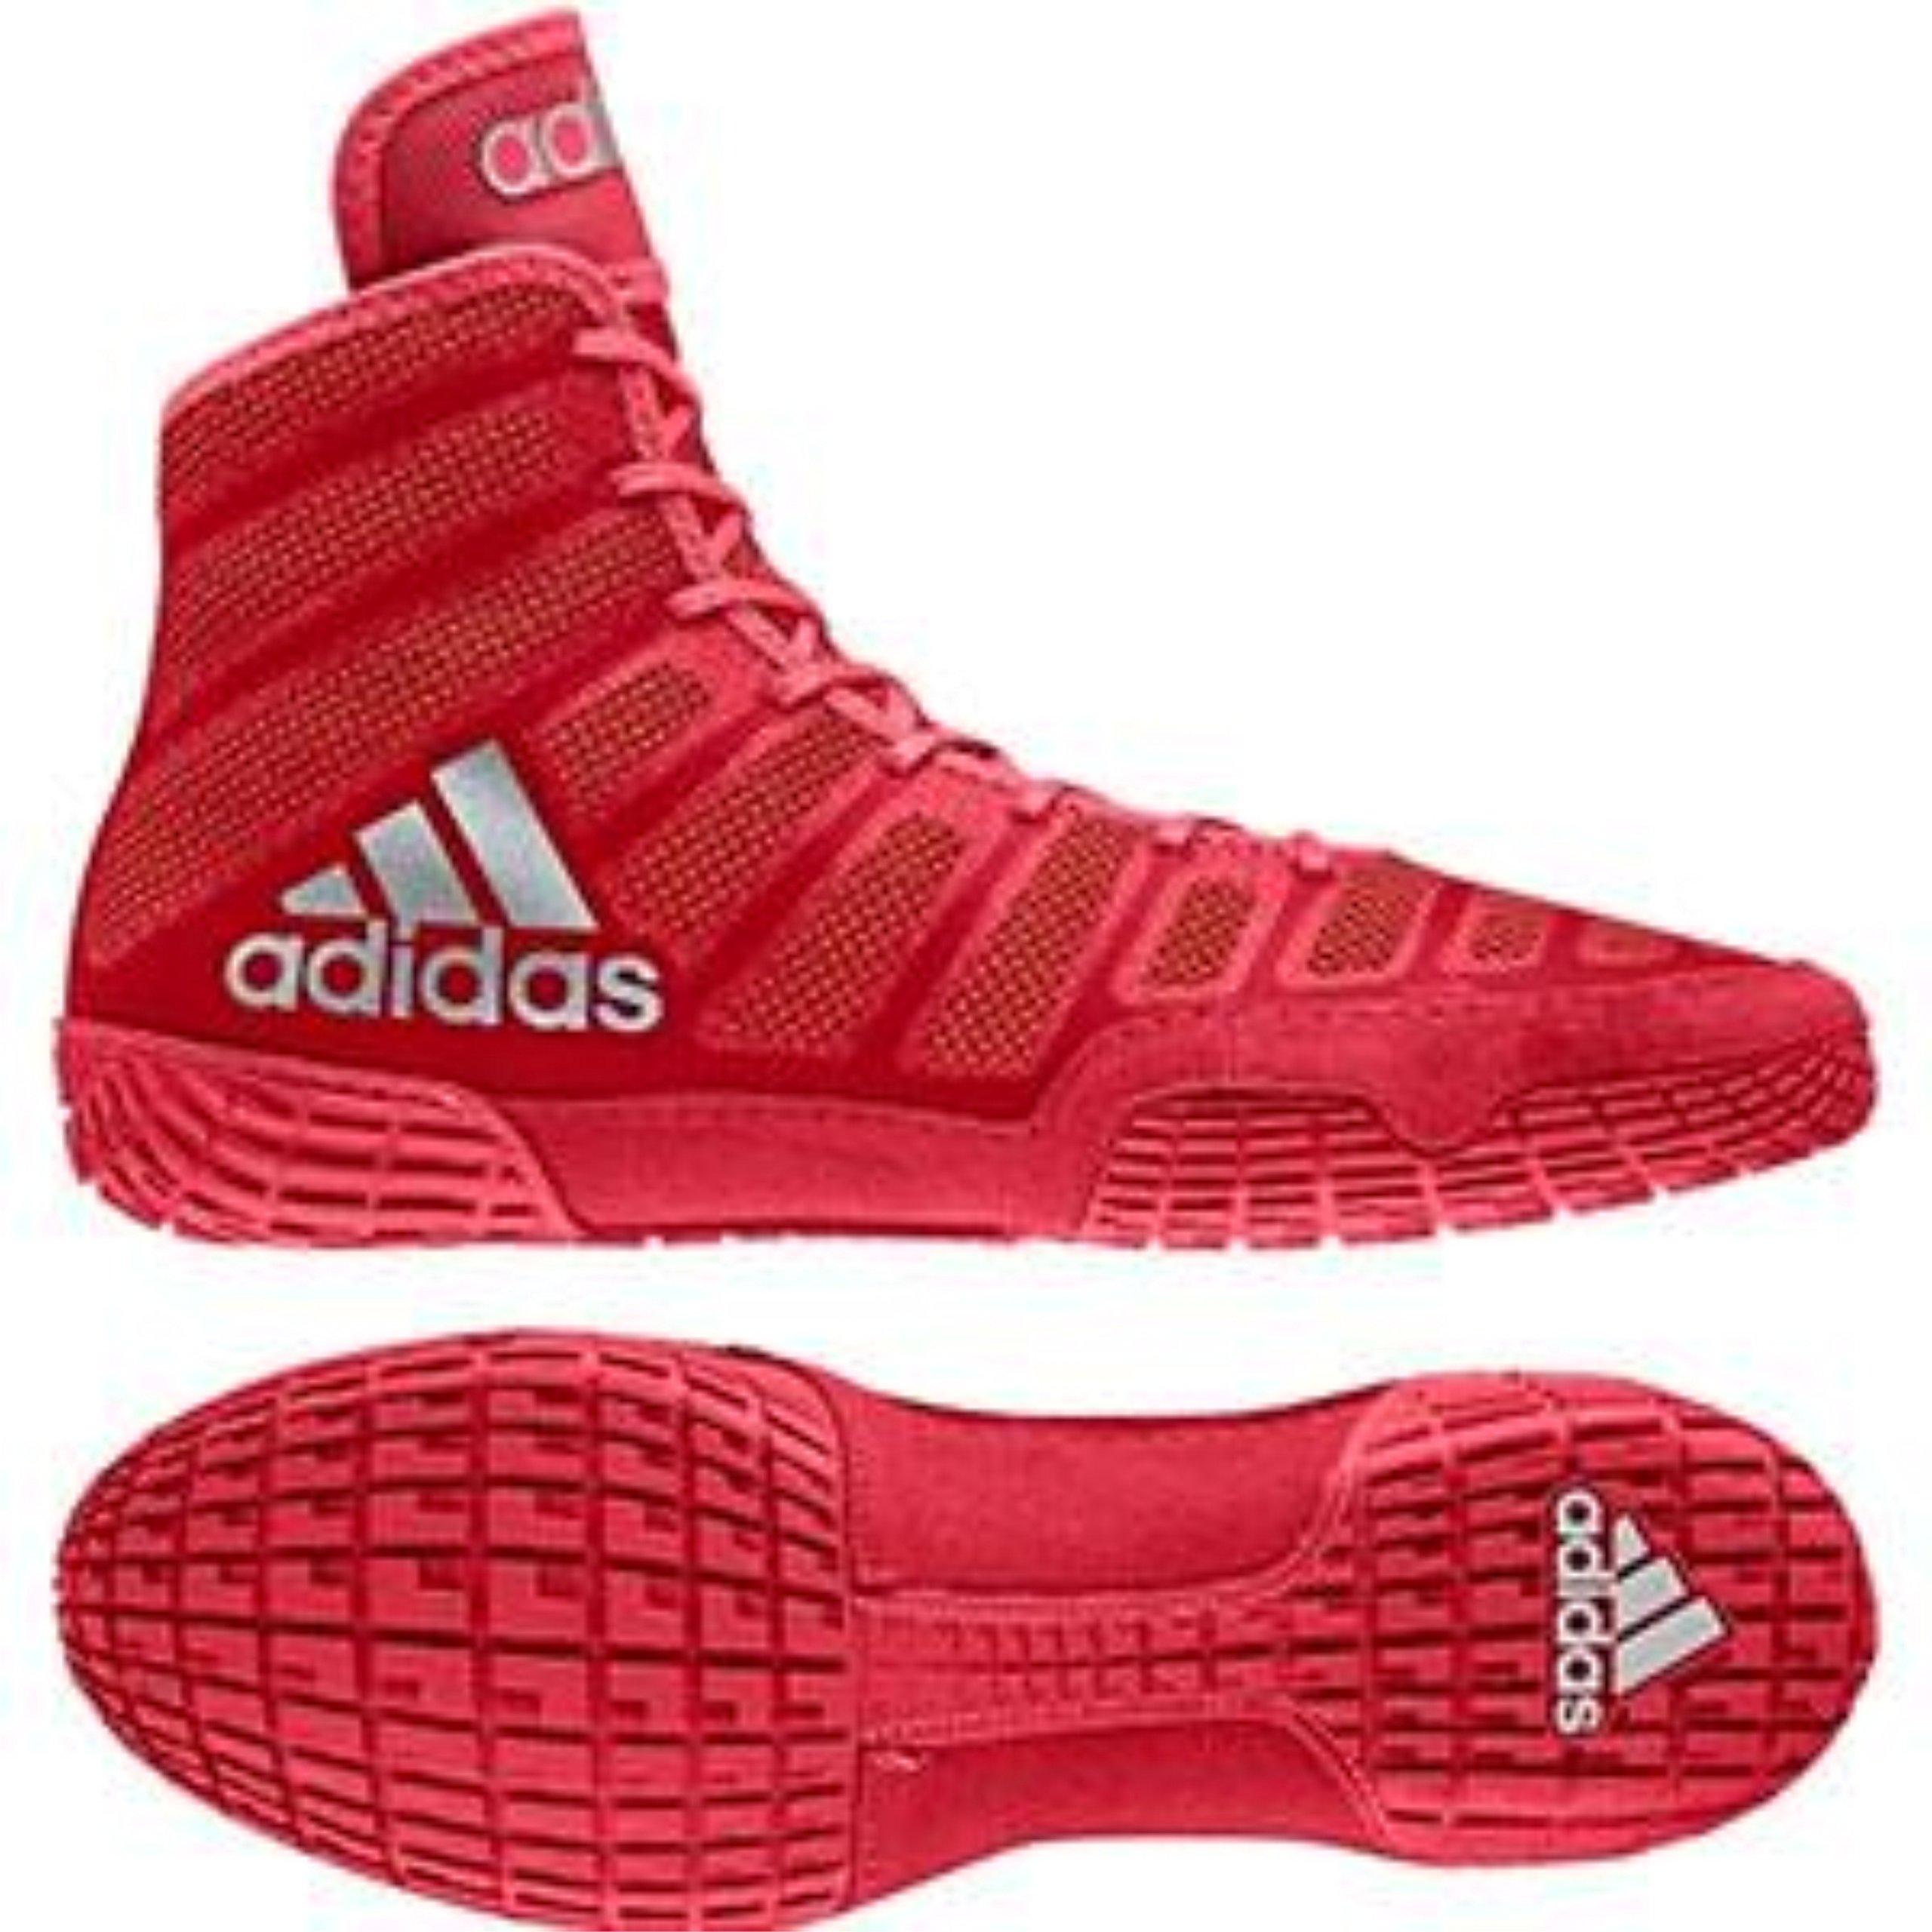 online retailer f36f1 39320 ... ireland galleon adidas mens adizero varner wrestling shoes red silver  size 6 78abc 6178a